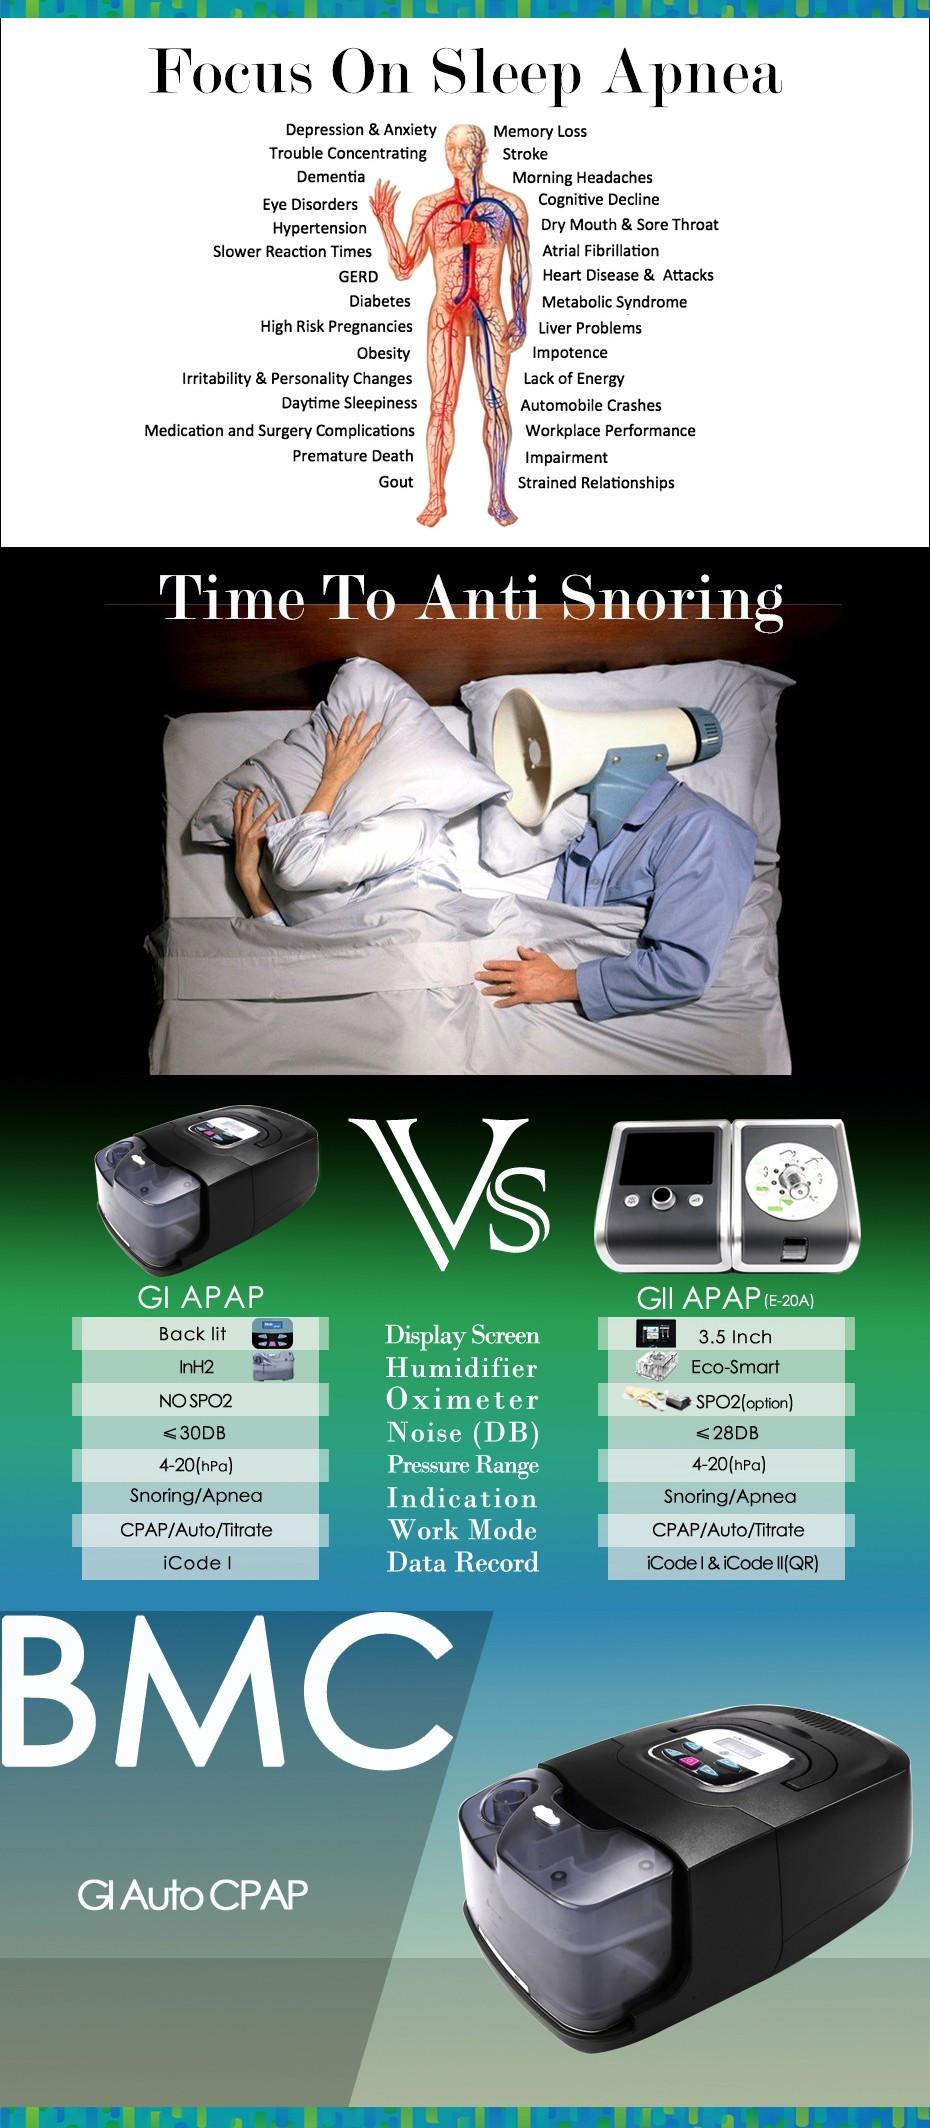 Doctodd GI APAP Auto CPAP GI APAP Machine for Sleep Snoring And Apnea Therapy APAP With Humidifier Nasal Mask Tubing and Bag (14)